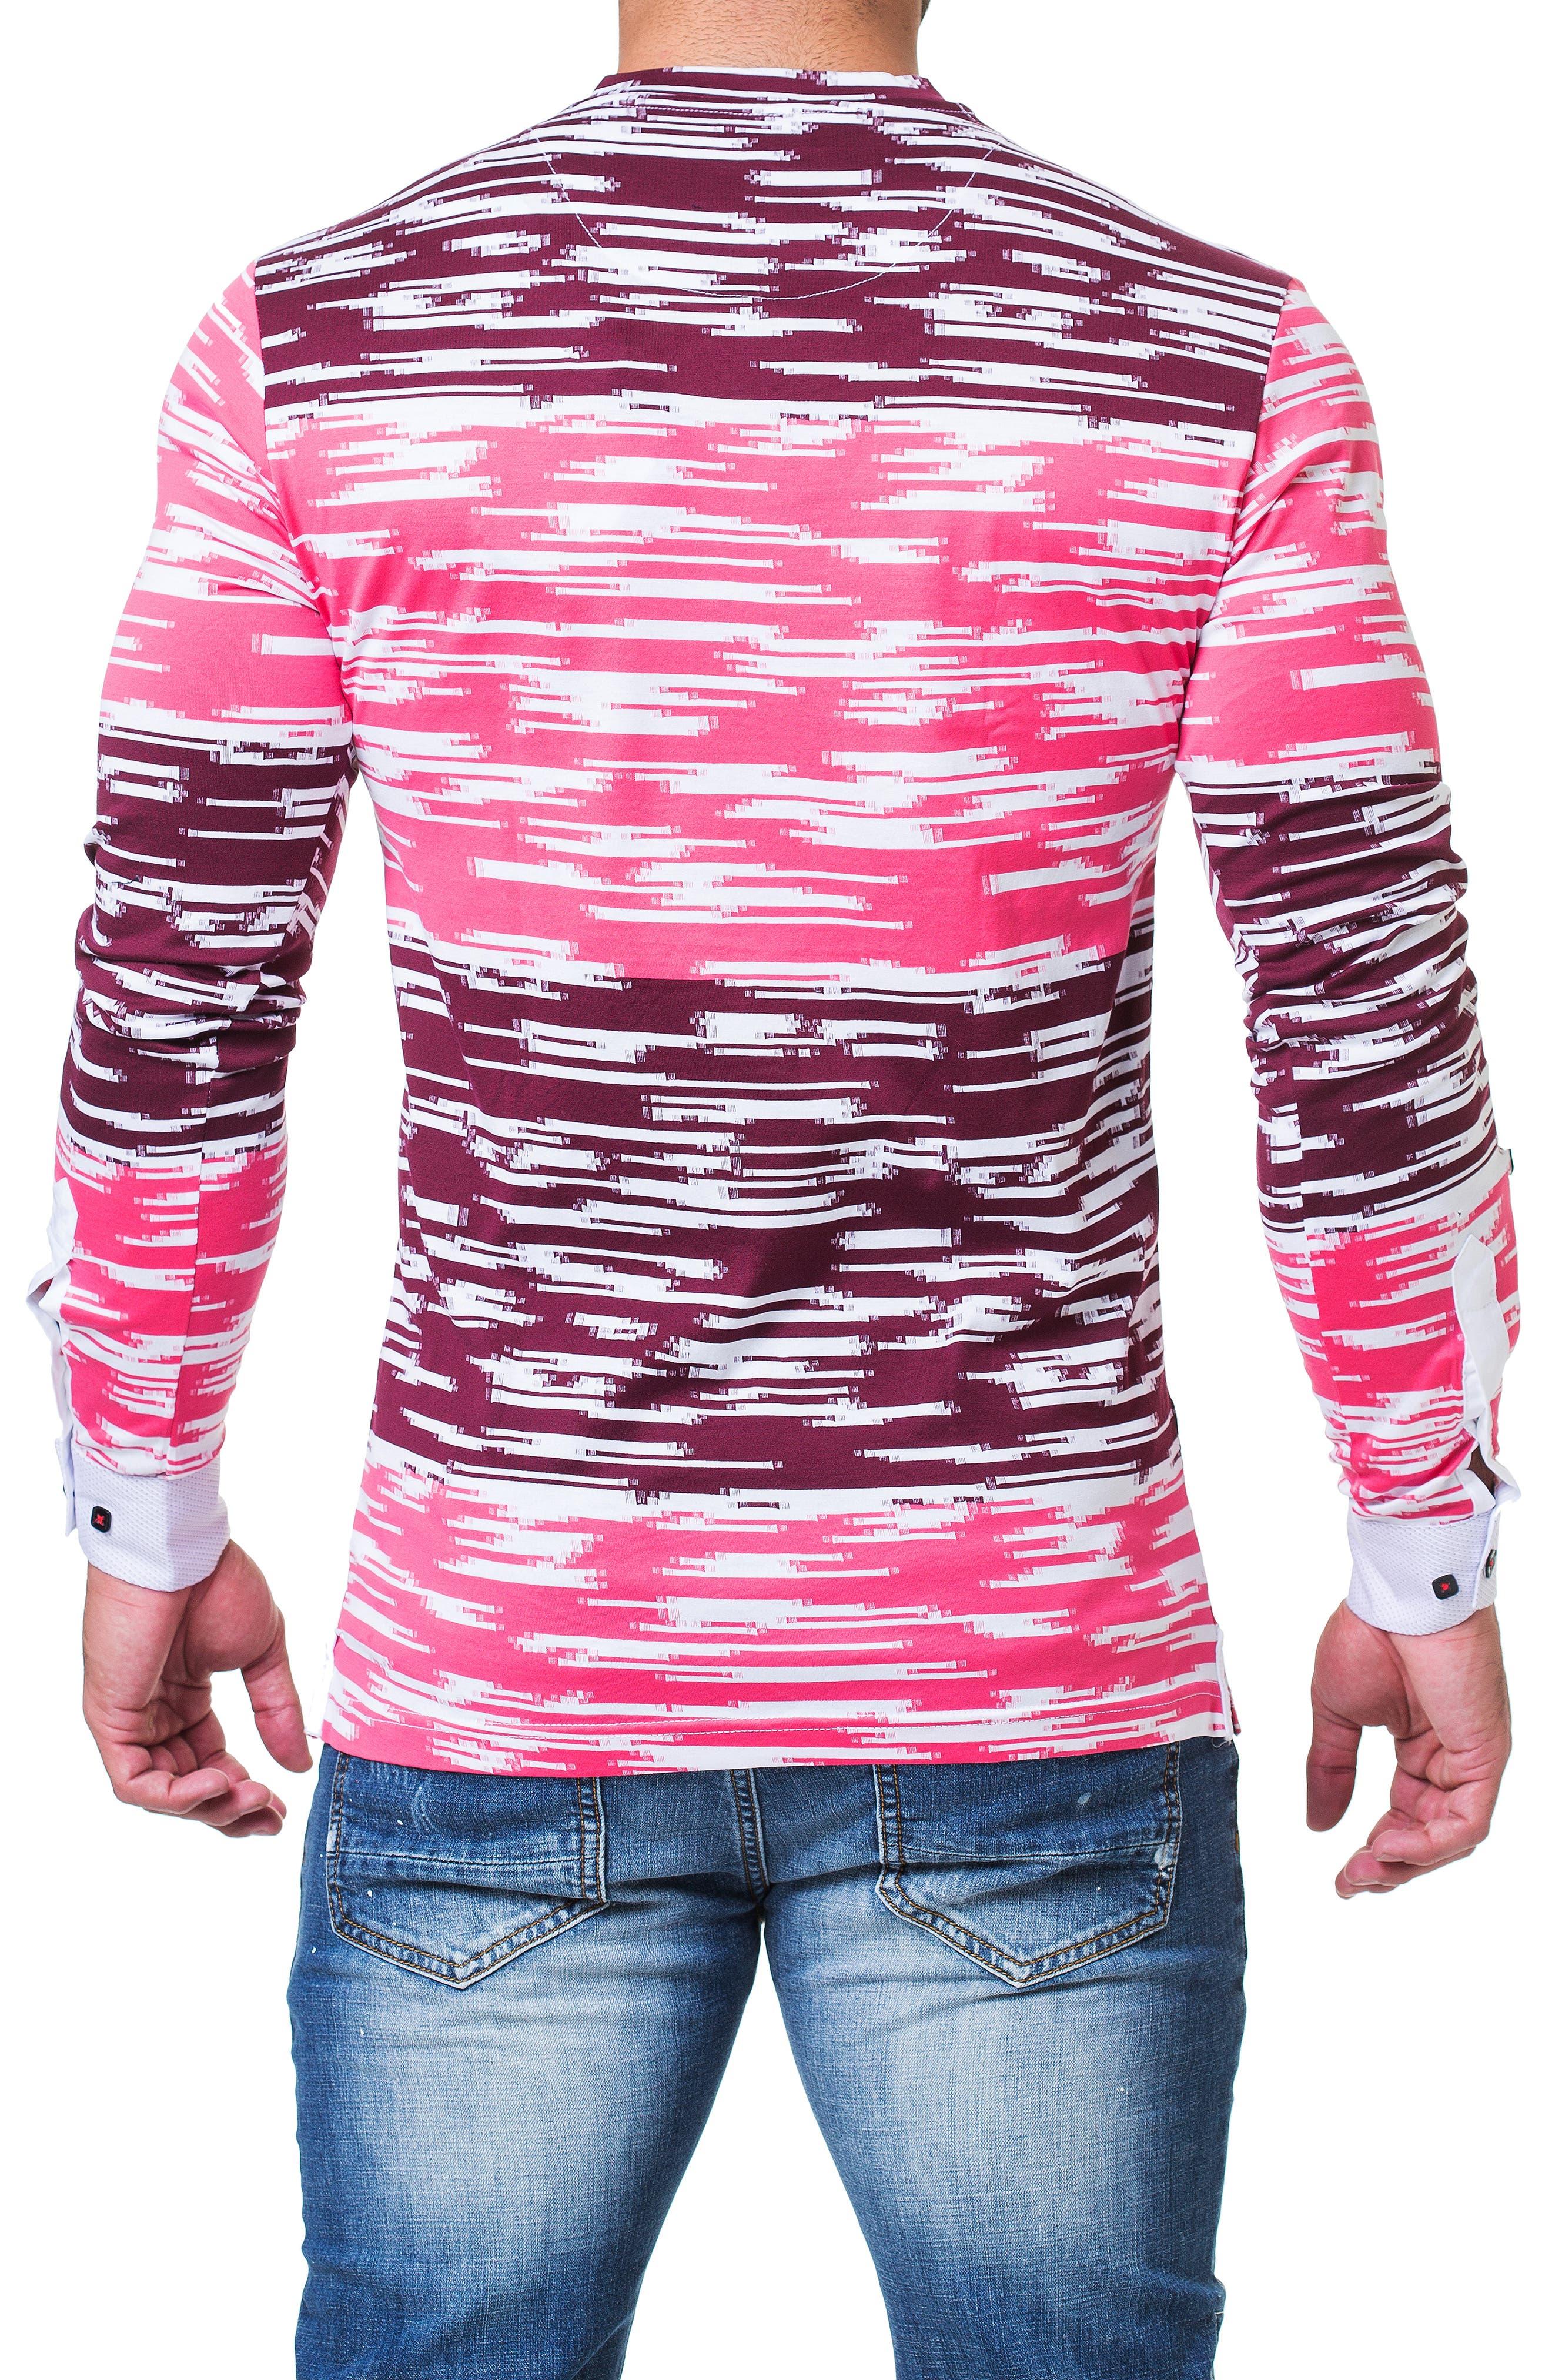 Edison Trim Fit Print T-Shirt,                             Alternate thumbnail 2, color,                             BLACK